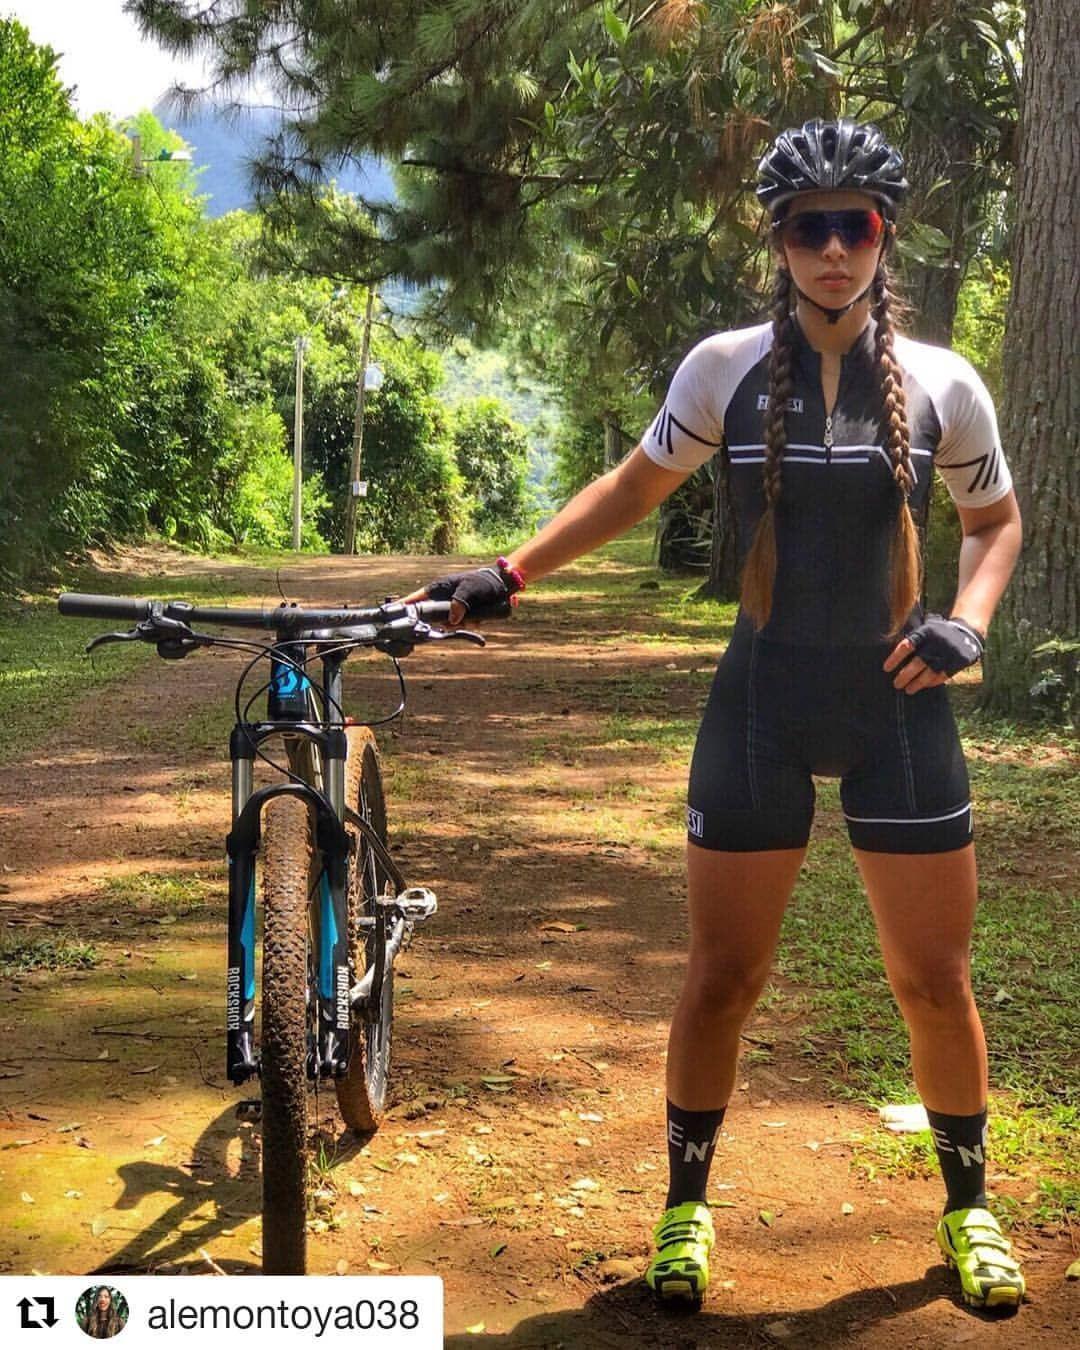 "31cda4f85 Giro Bike Team auf Instagram  "" Repost  alemontoya038 ( get repost) ・・・ con  mi Azuleja 🙋🏻 ♀ 🚲💕 .  cyclingwear  frenesi  colombia  hechoencolombia  ..."